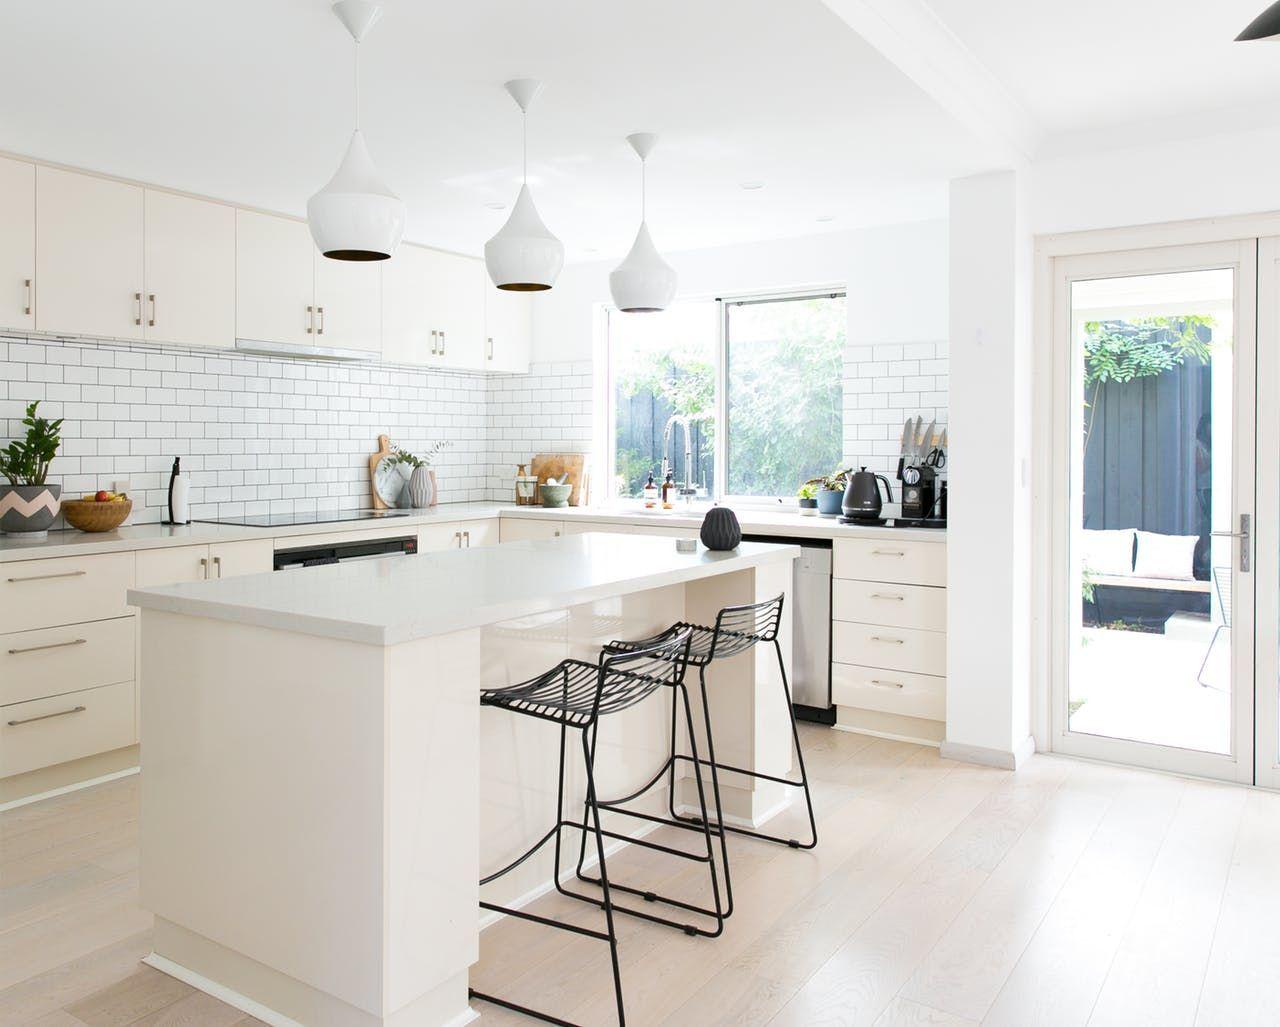 17 Distinctive Kitchen Lighting Ideas For Your Wonderful